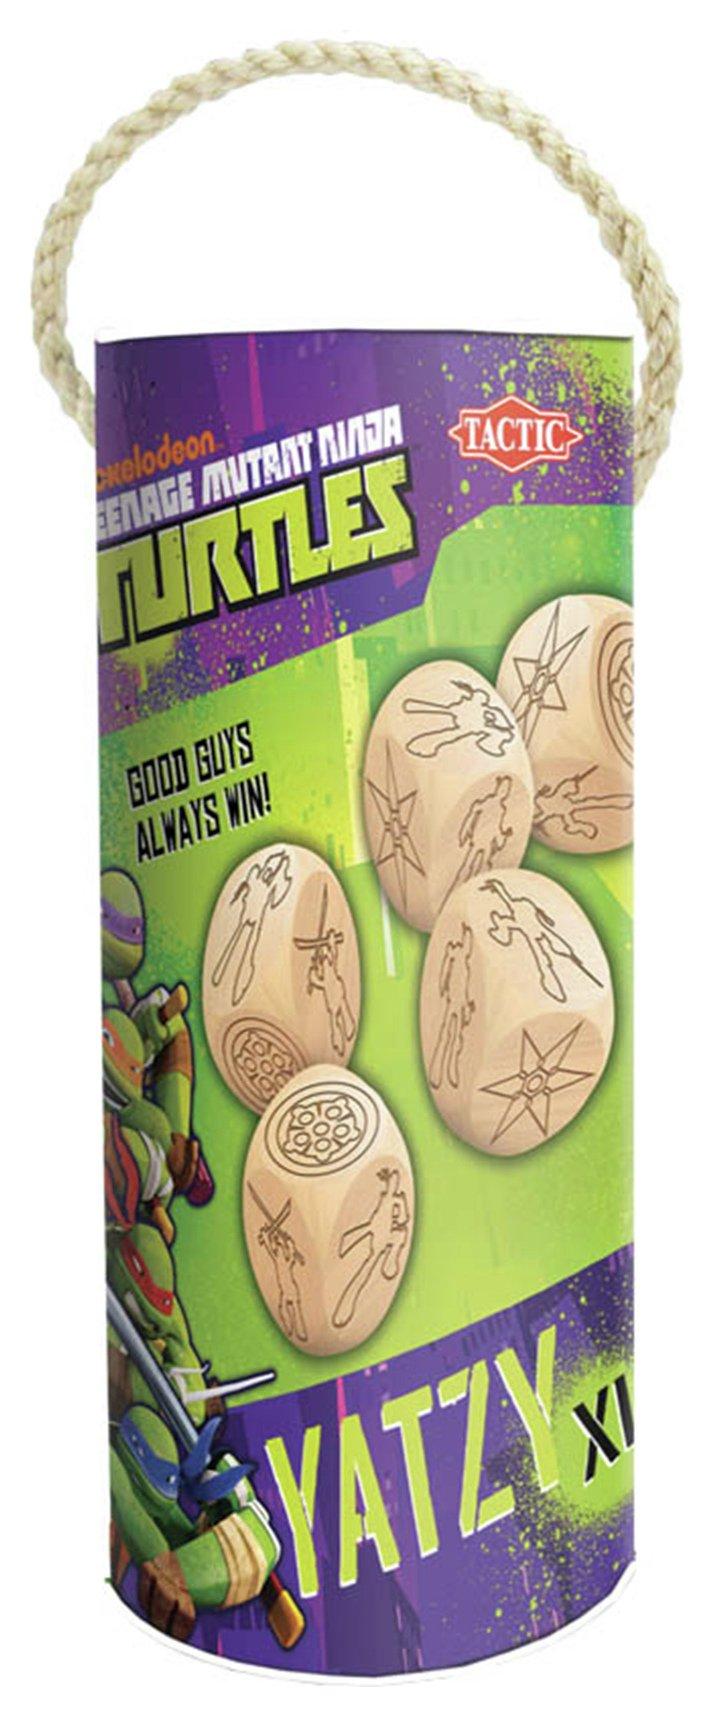 Teenage Mutant Ninja Turtles Yatzy. review